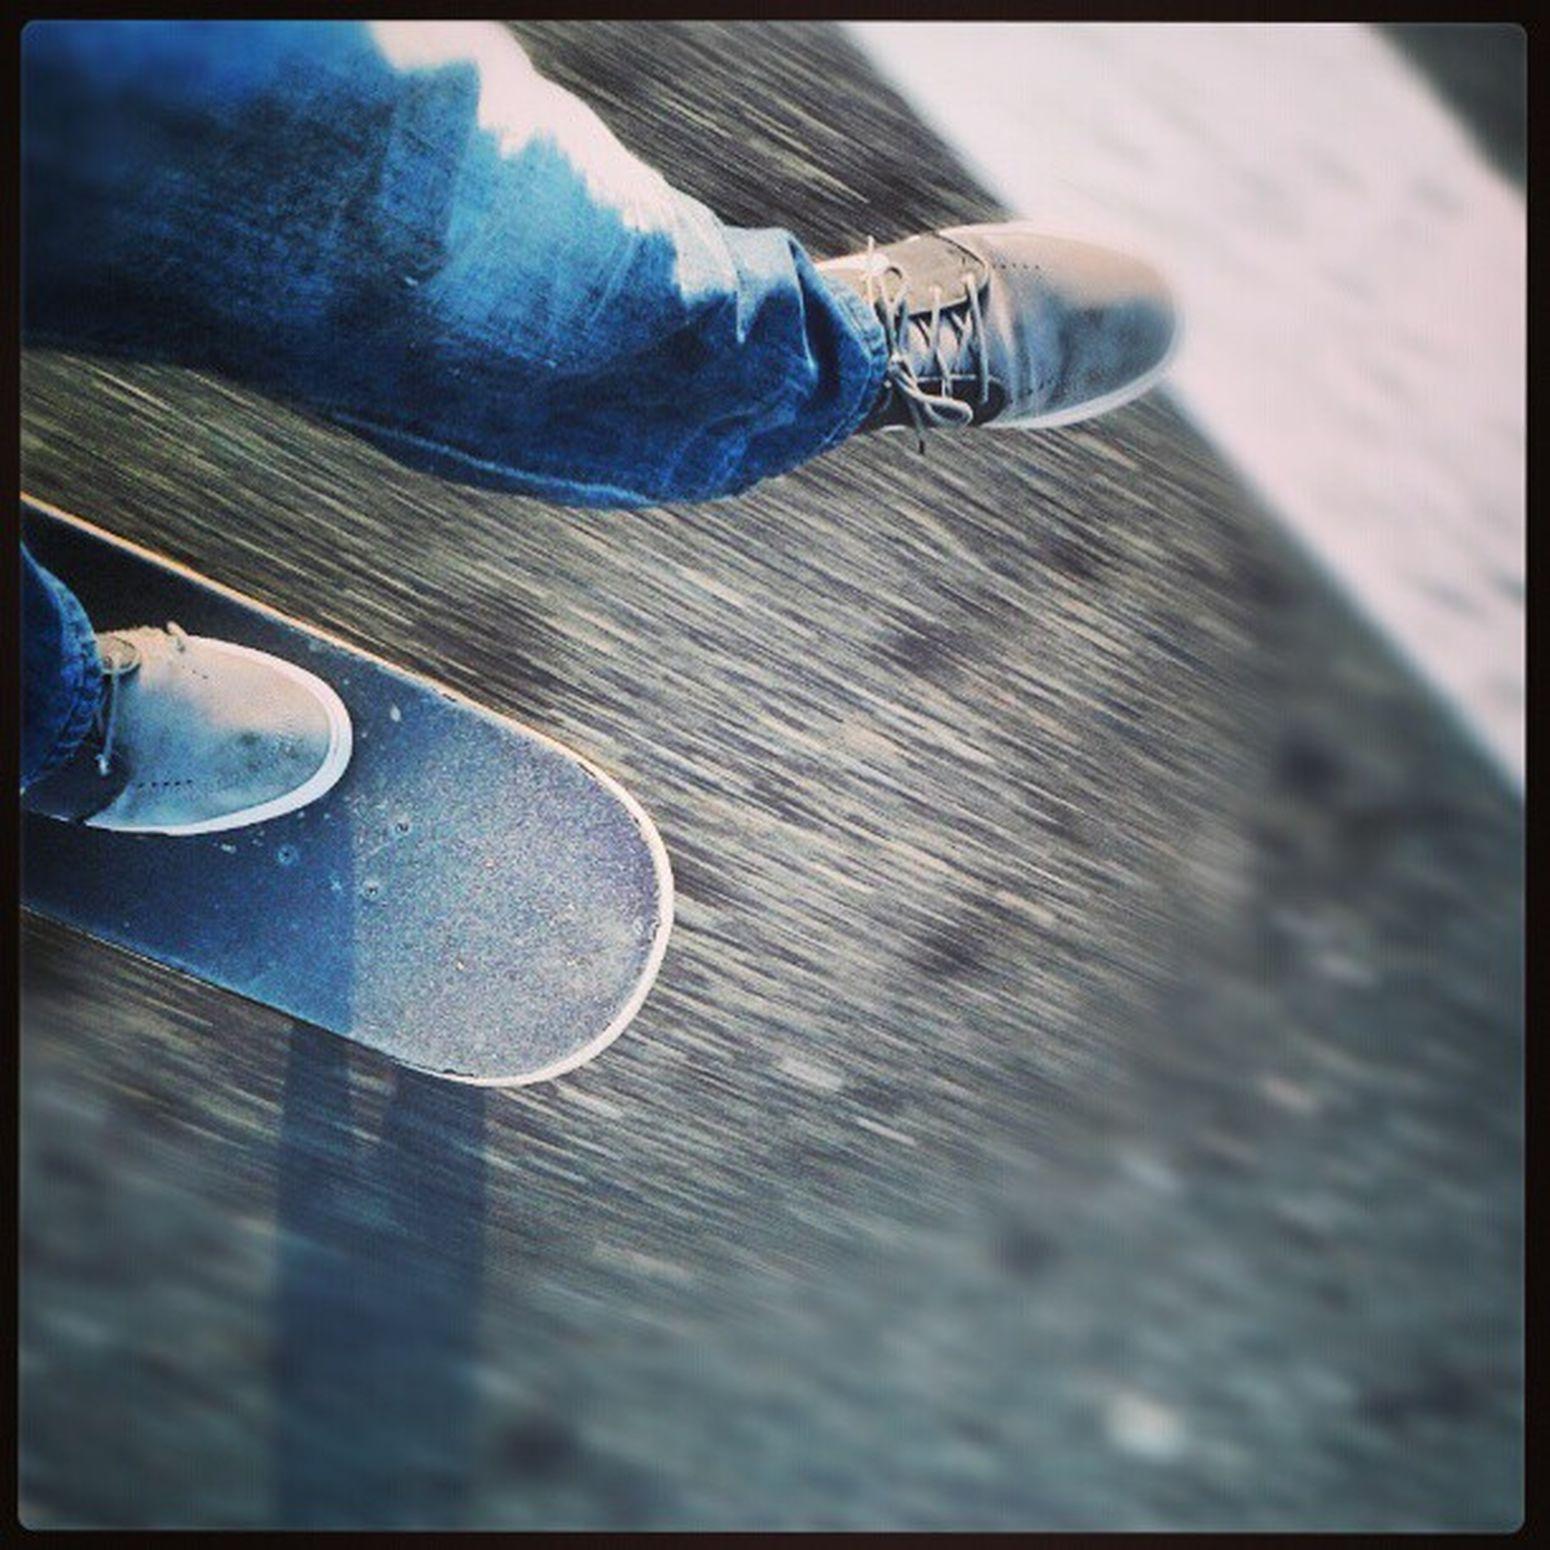 I'm in the streets. Fuck with me. Skateeverydamnday Nikesb Nikeskateboarding Skatefast skatelife solohype fuckfriends fuckwithme skateboarding